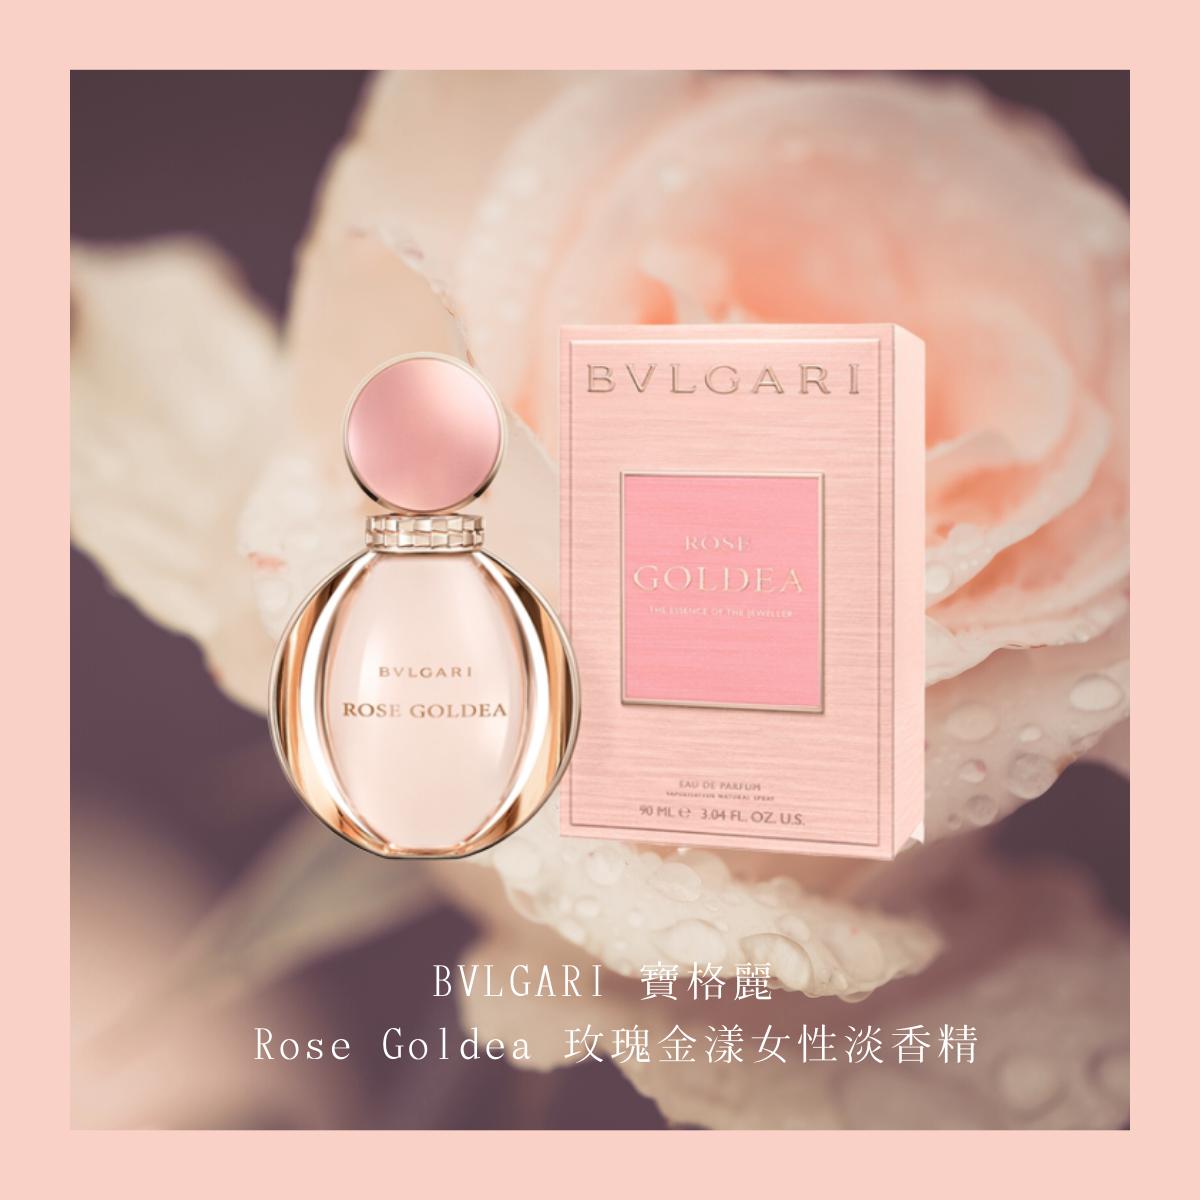 BVLGARI 寶格麗 Rose Goldea 玫瑰金漾女性淡香精